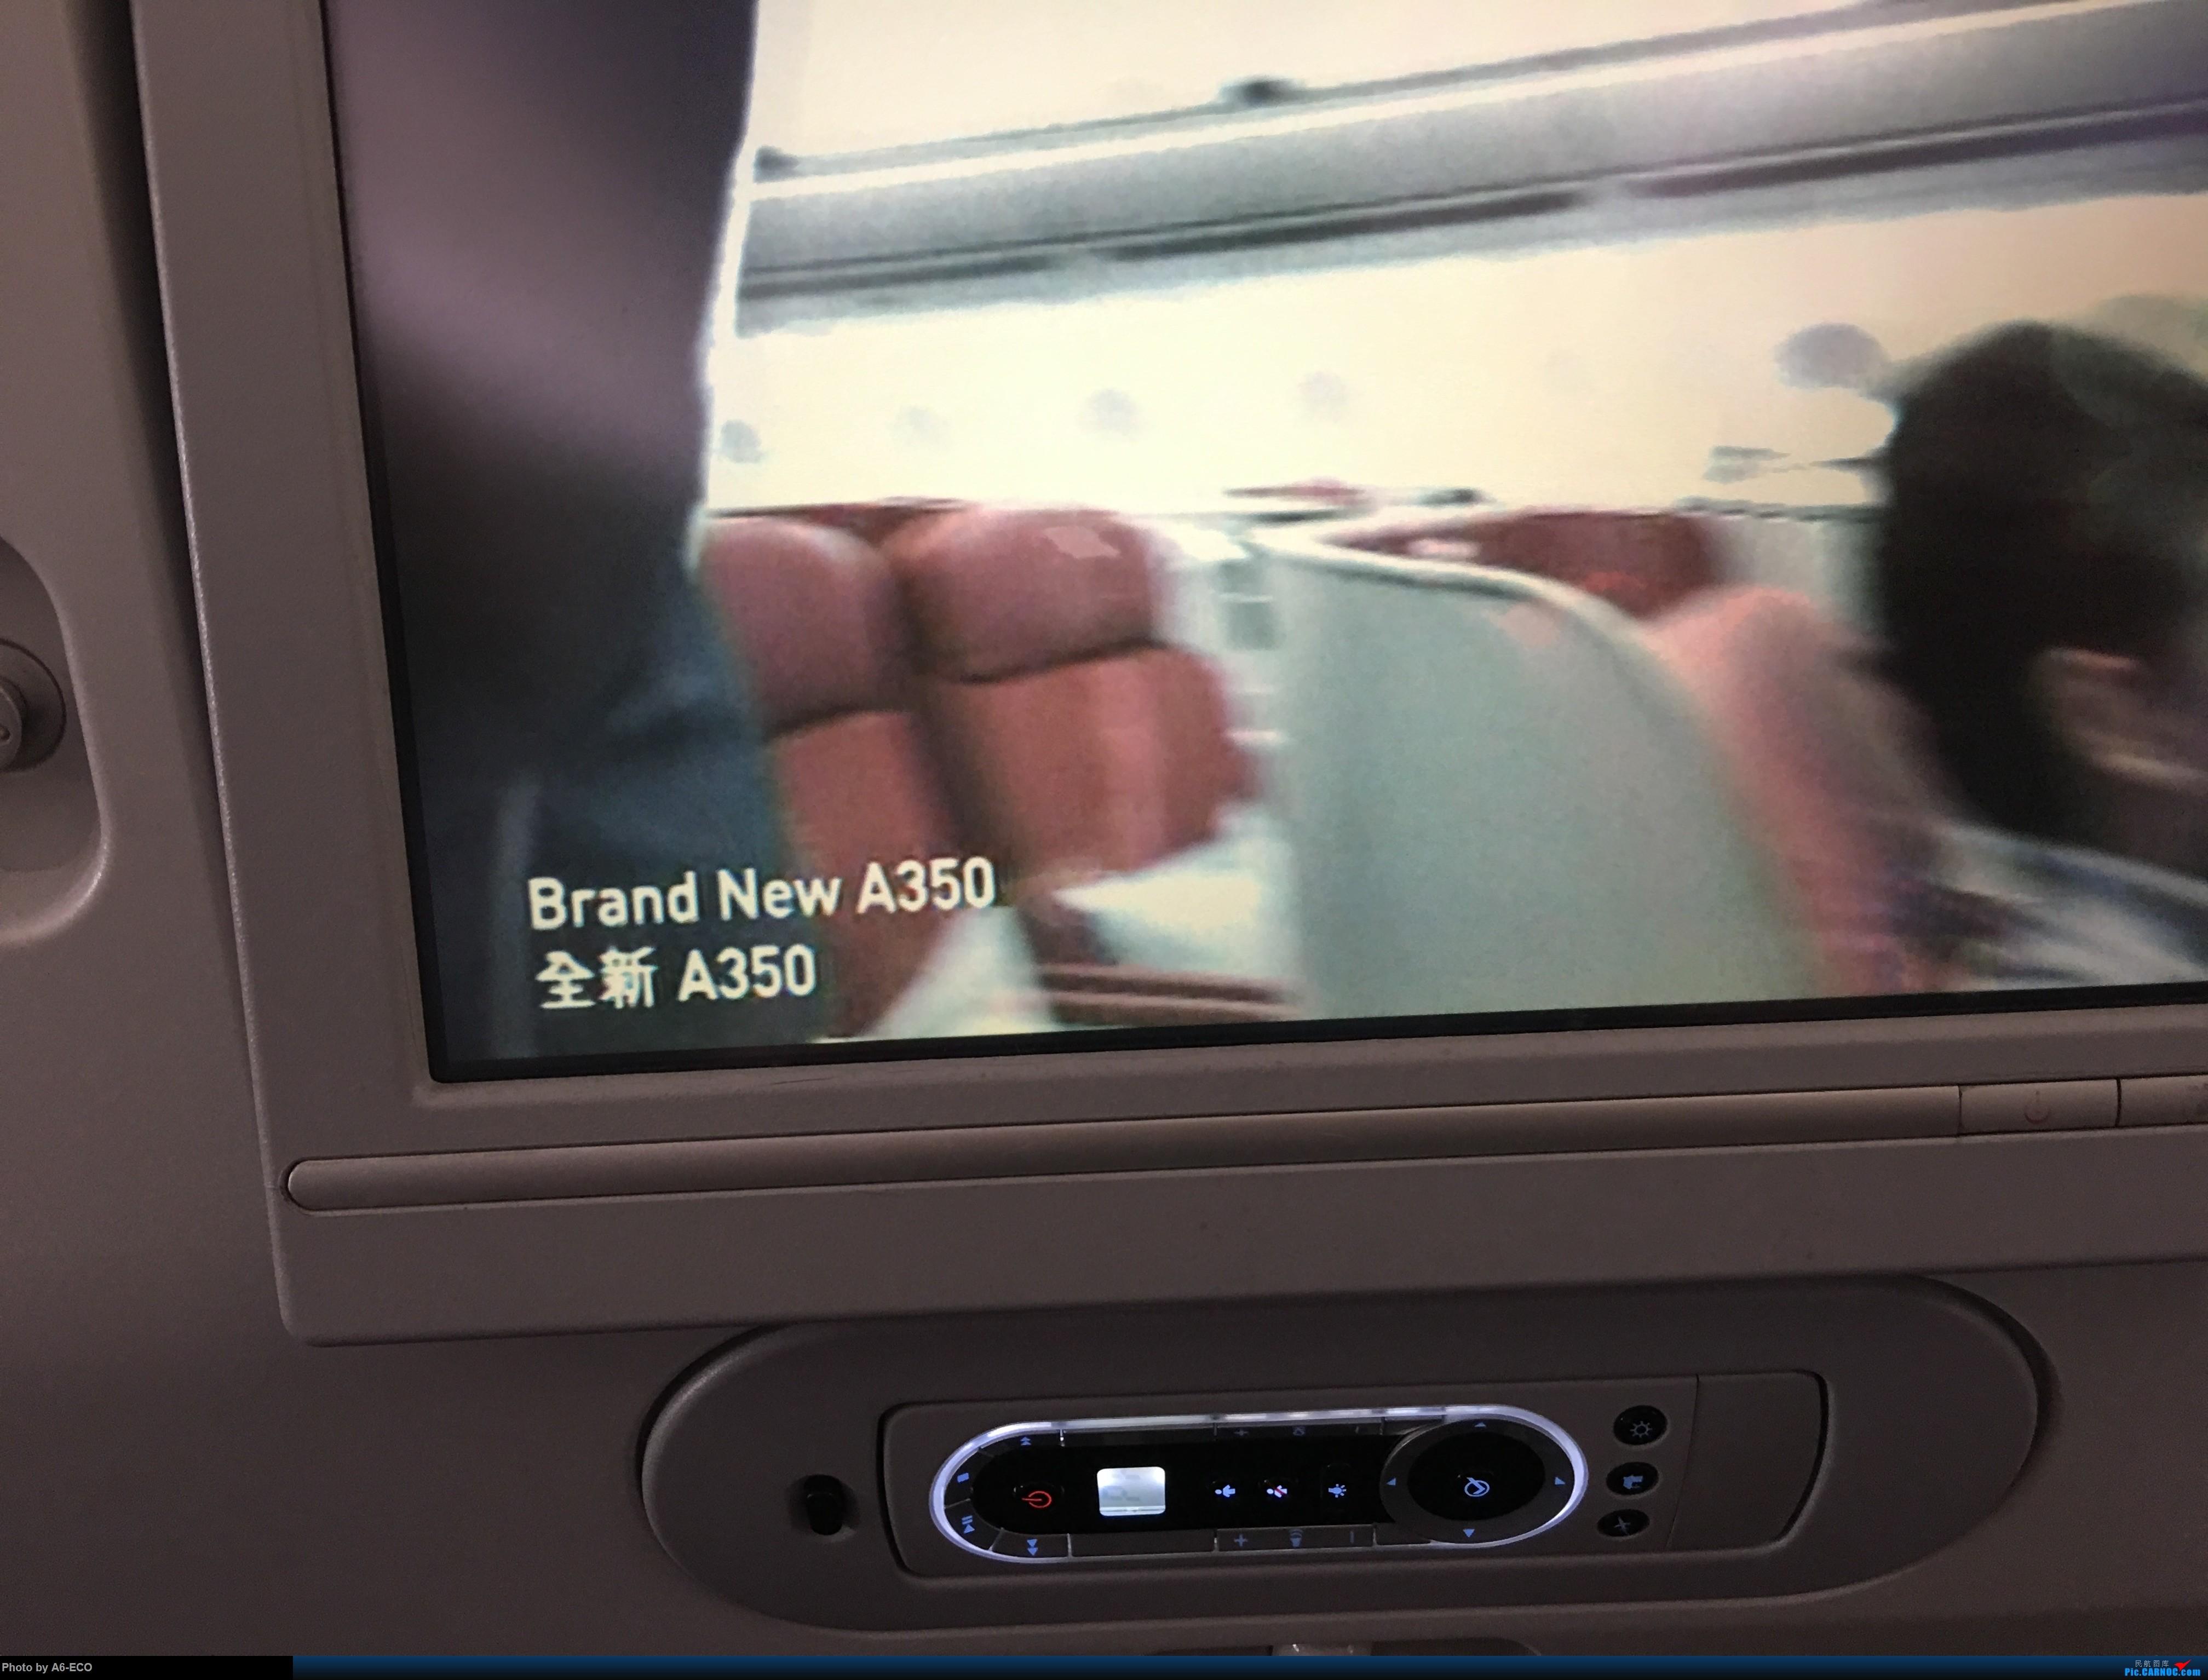 Re:[原创]海鲜航305航班+hxg拍机+香港推荐美食+回程海鲜航 AIRBUS A350-900 B-LGA 香港国际机场